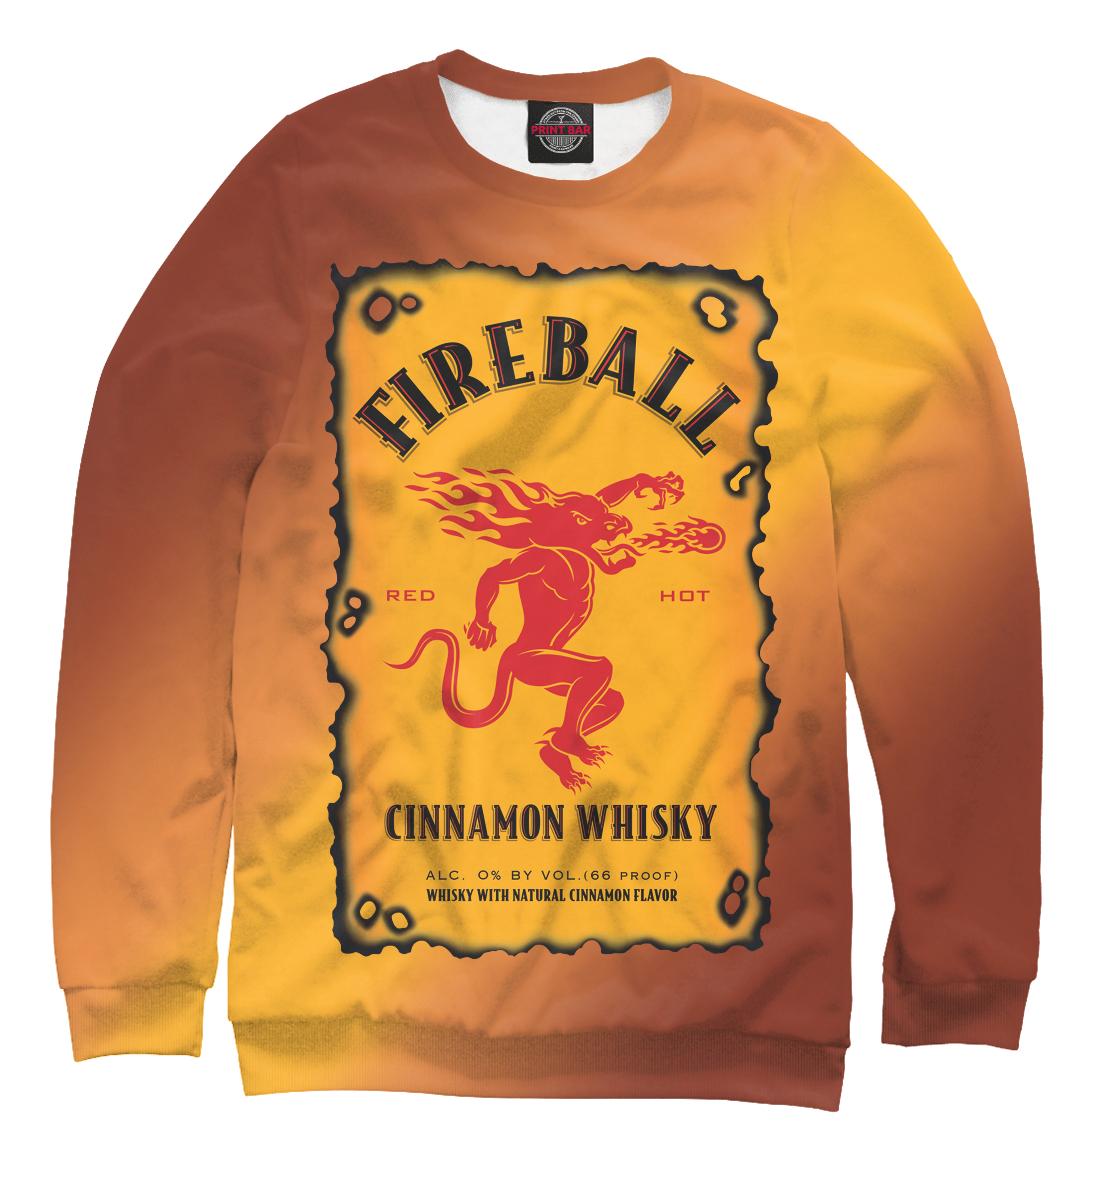 Купить Fireball Cinnamon Whisky безалкогольный, Printbar, Свитшоты, MZH-236838-swi-1